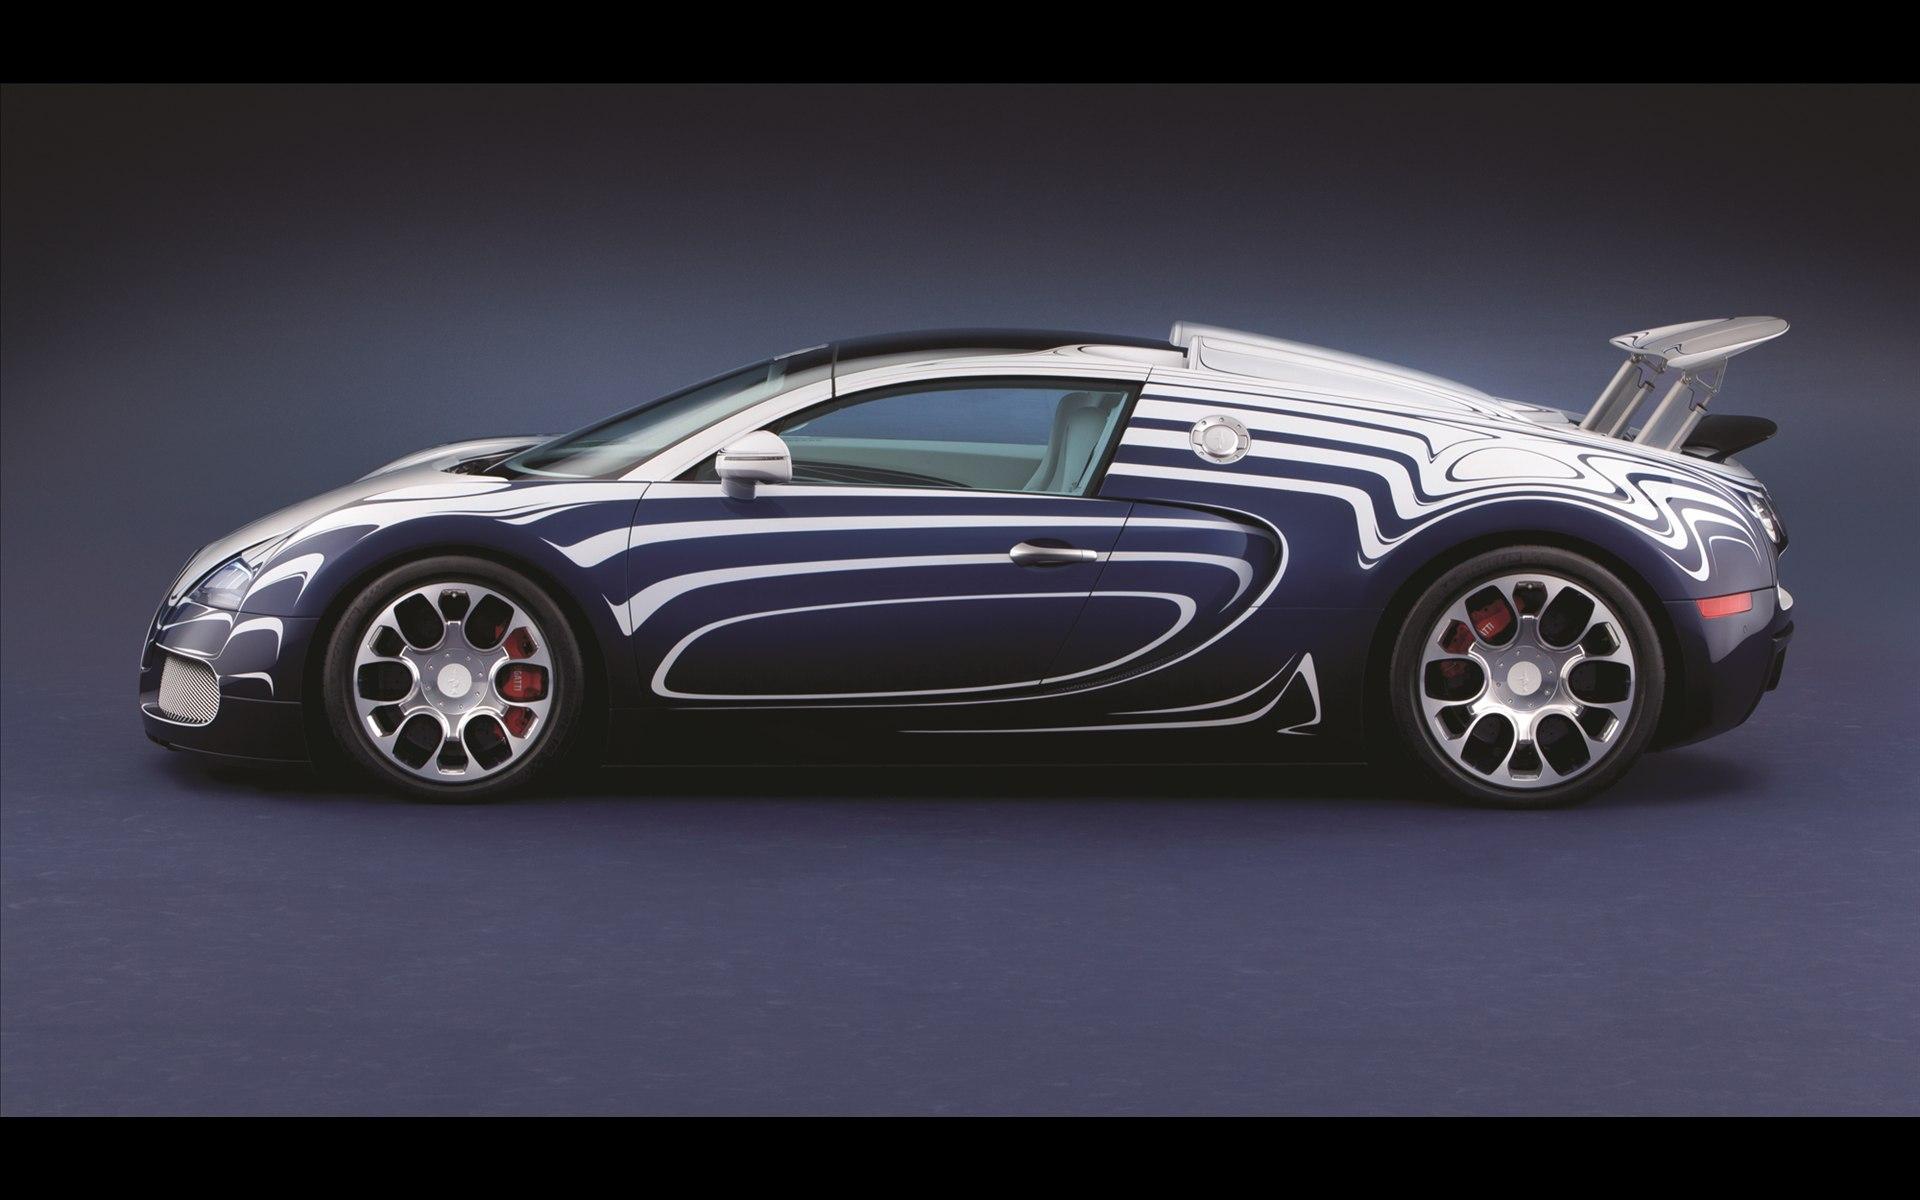 Bugatti-Veyron-Grand-Sport-LOr-Blanc-2011-003 Astounding Xe Bugatti Veyron Grand Sport Vitesse Cars Trend